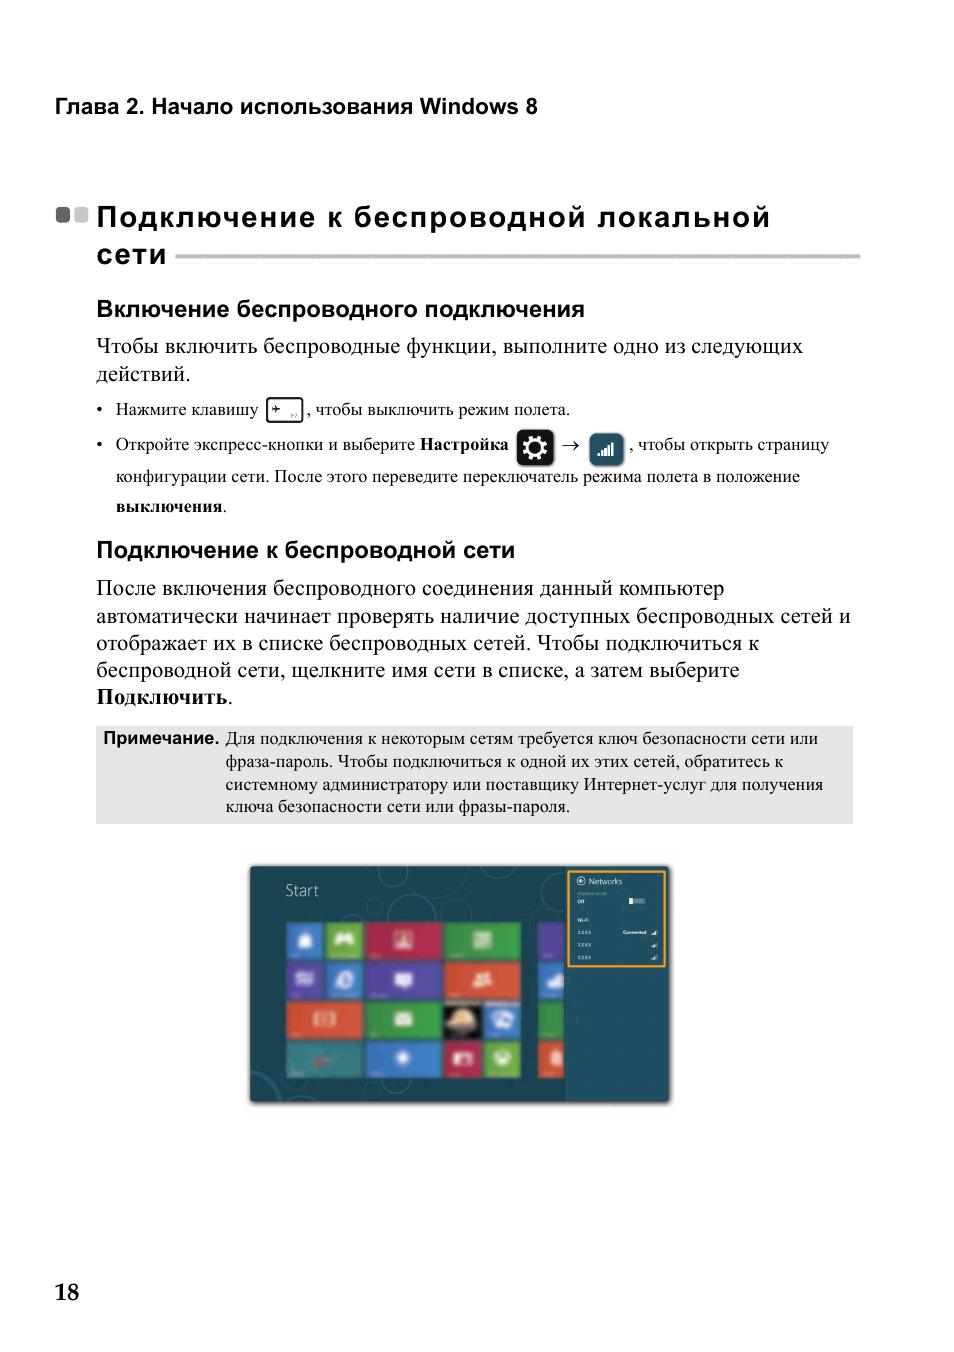 Инструкция по эксплуатации ноутбука леново